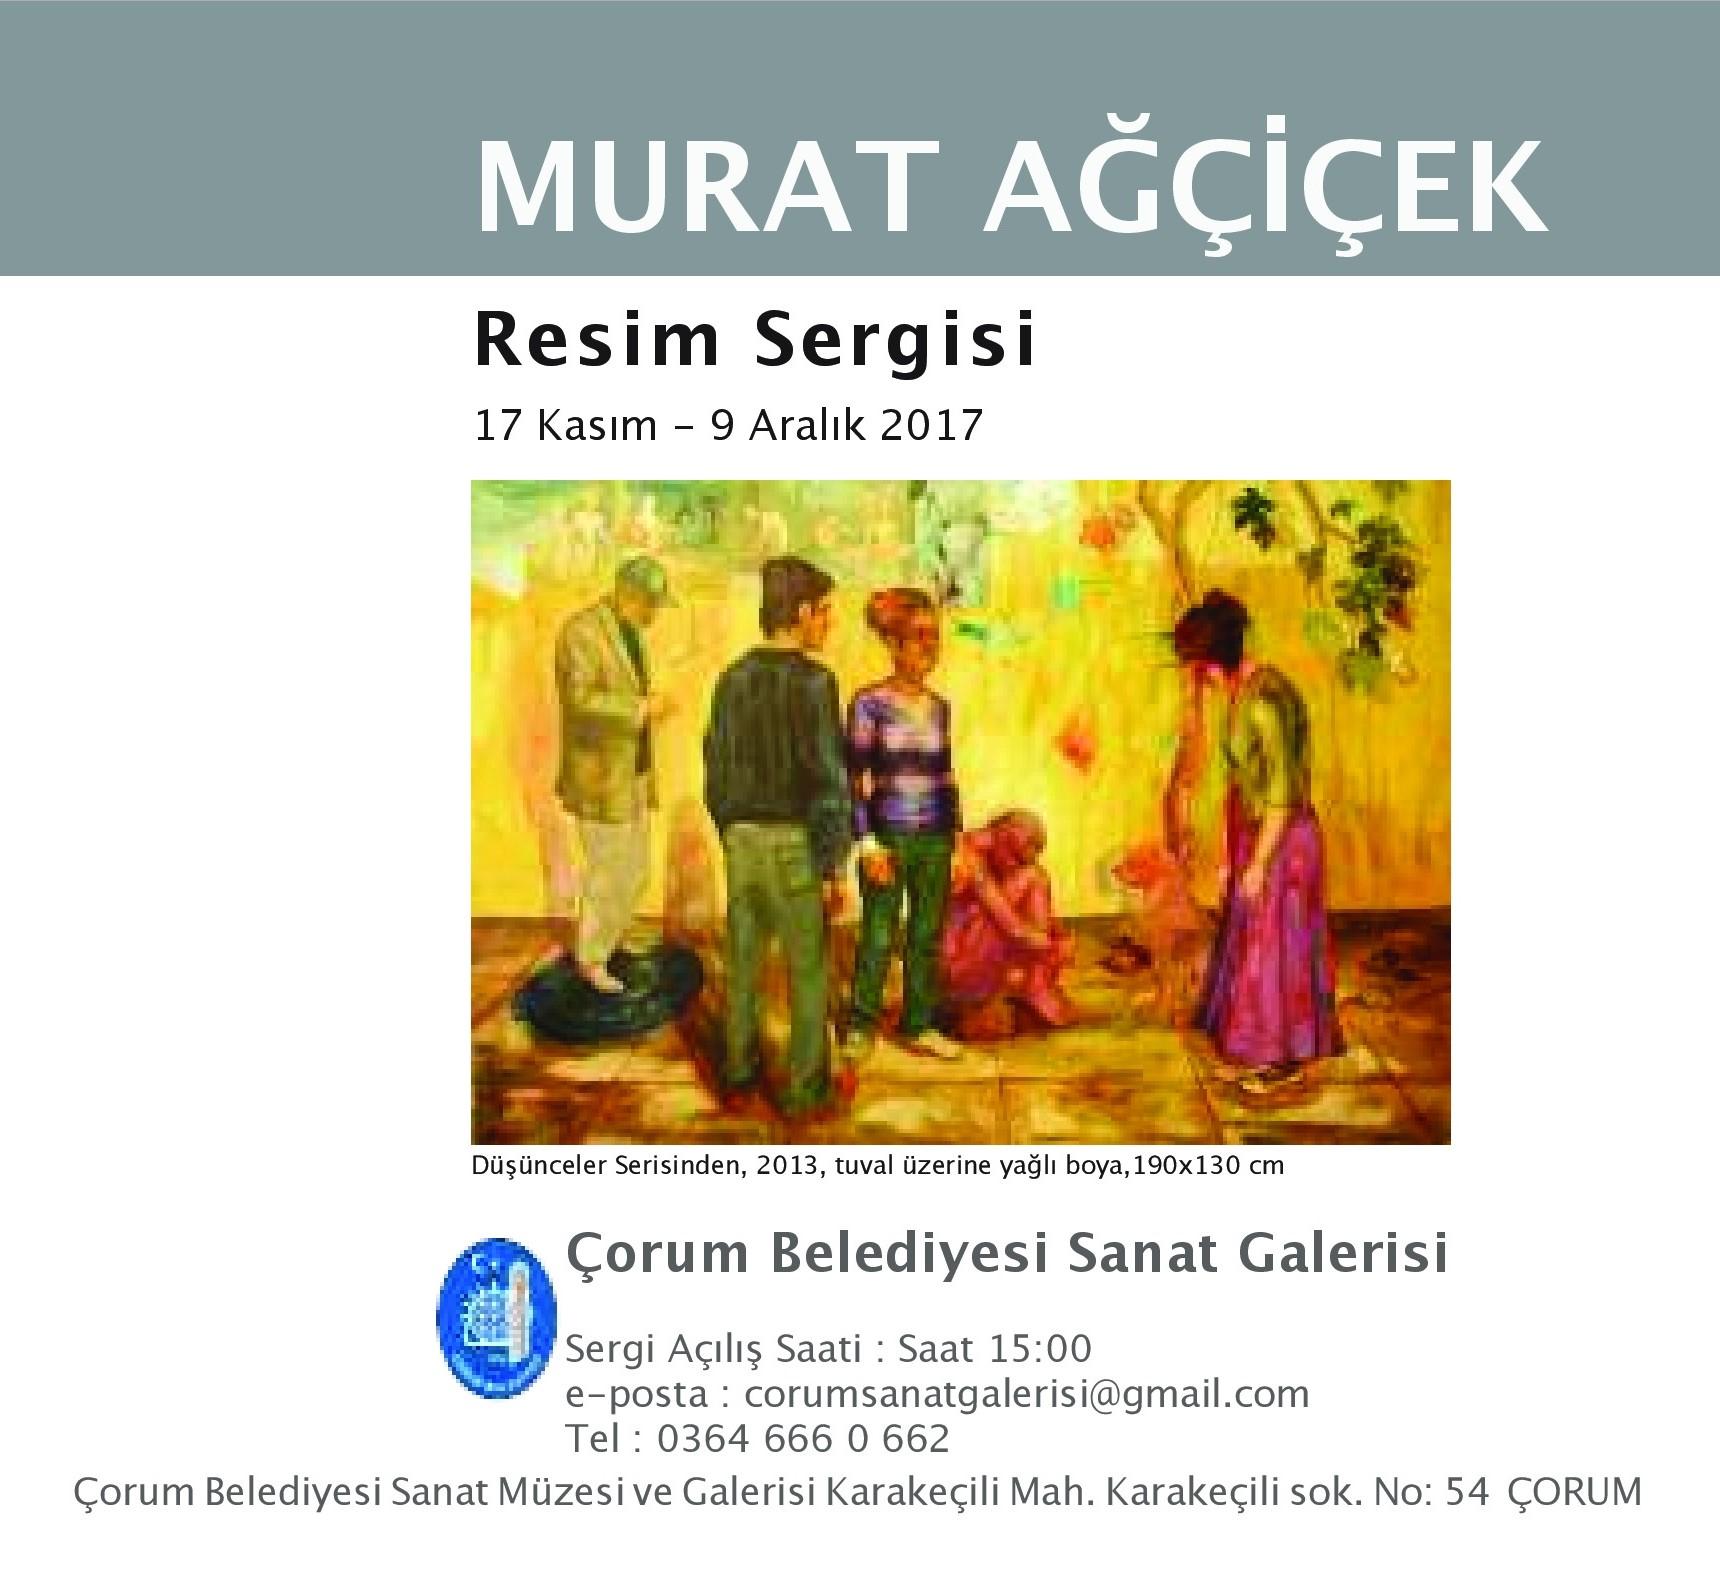 http://www.omu.edu.tr/sites/default/files/files/murat_agcicek_resim_sergisi/sergi.jpg